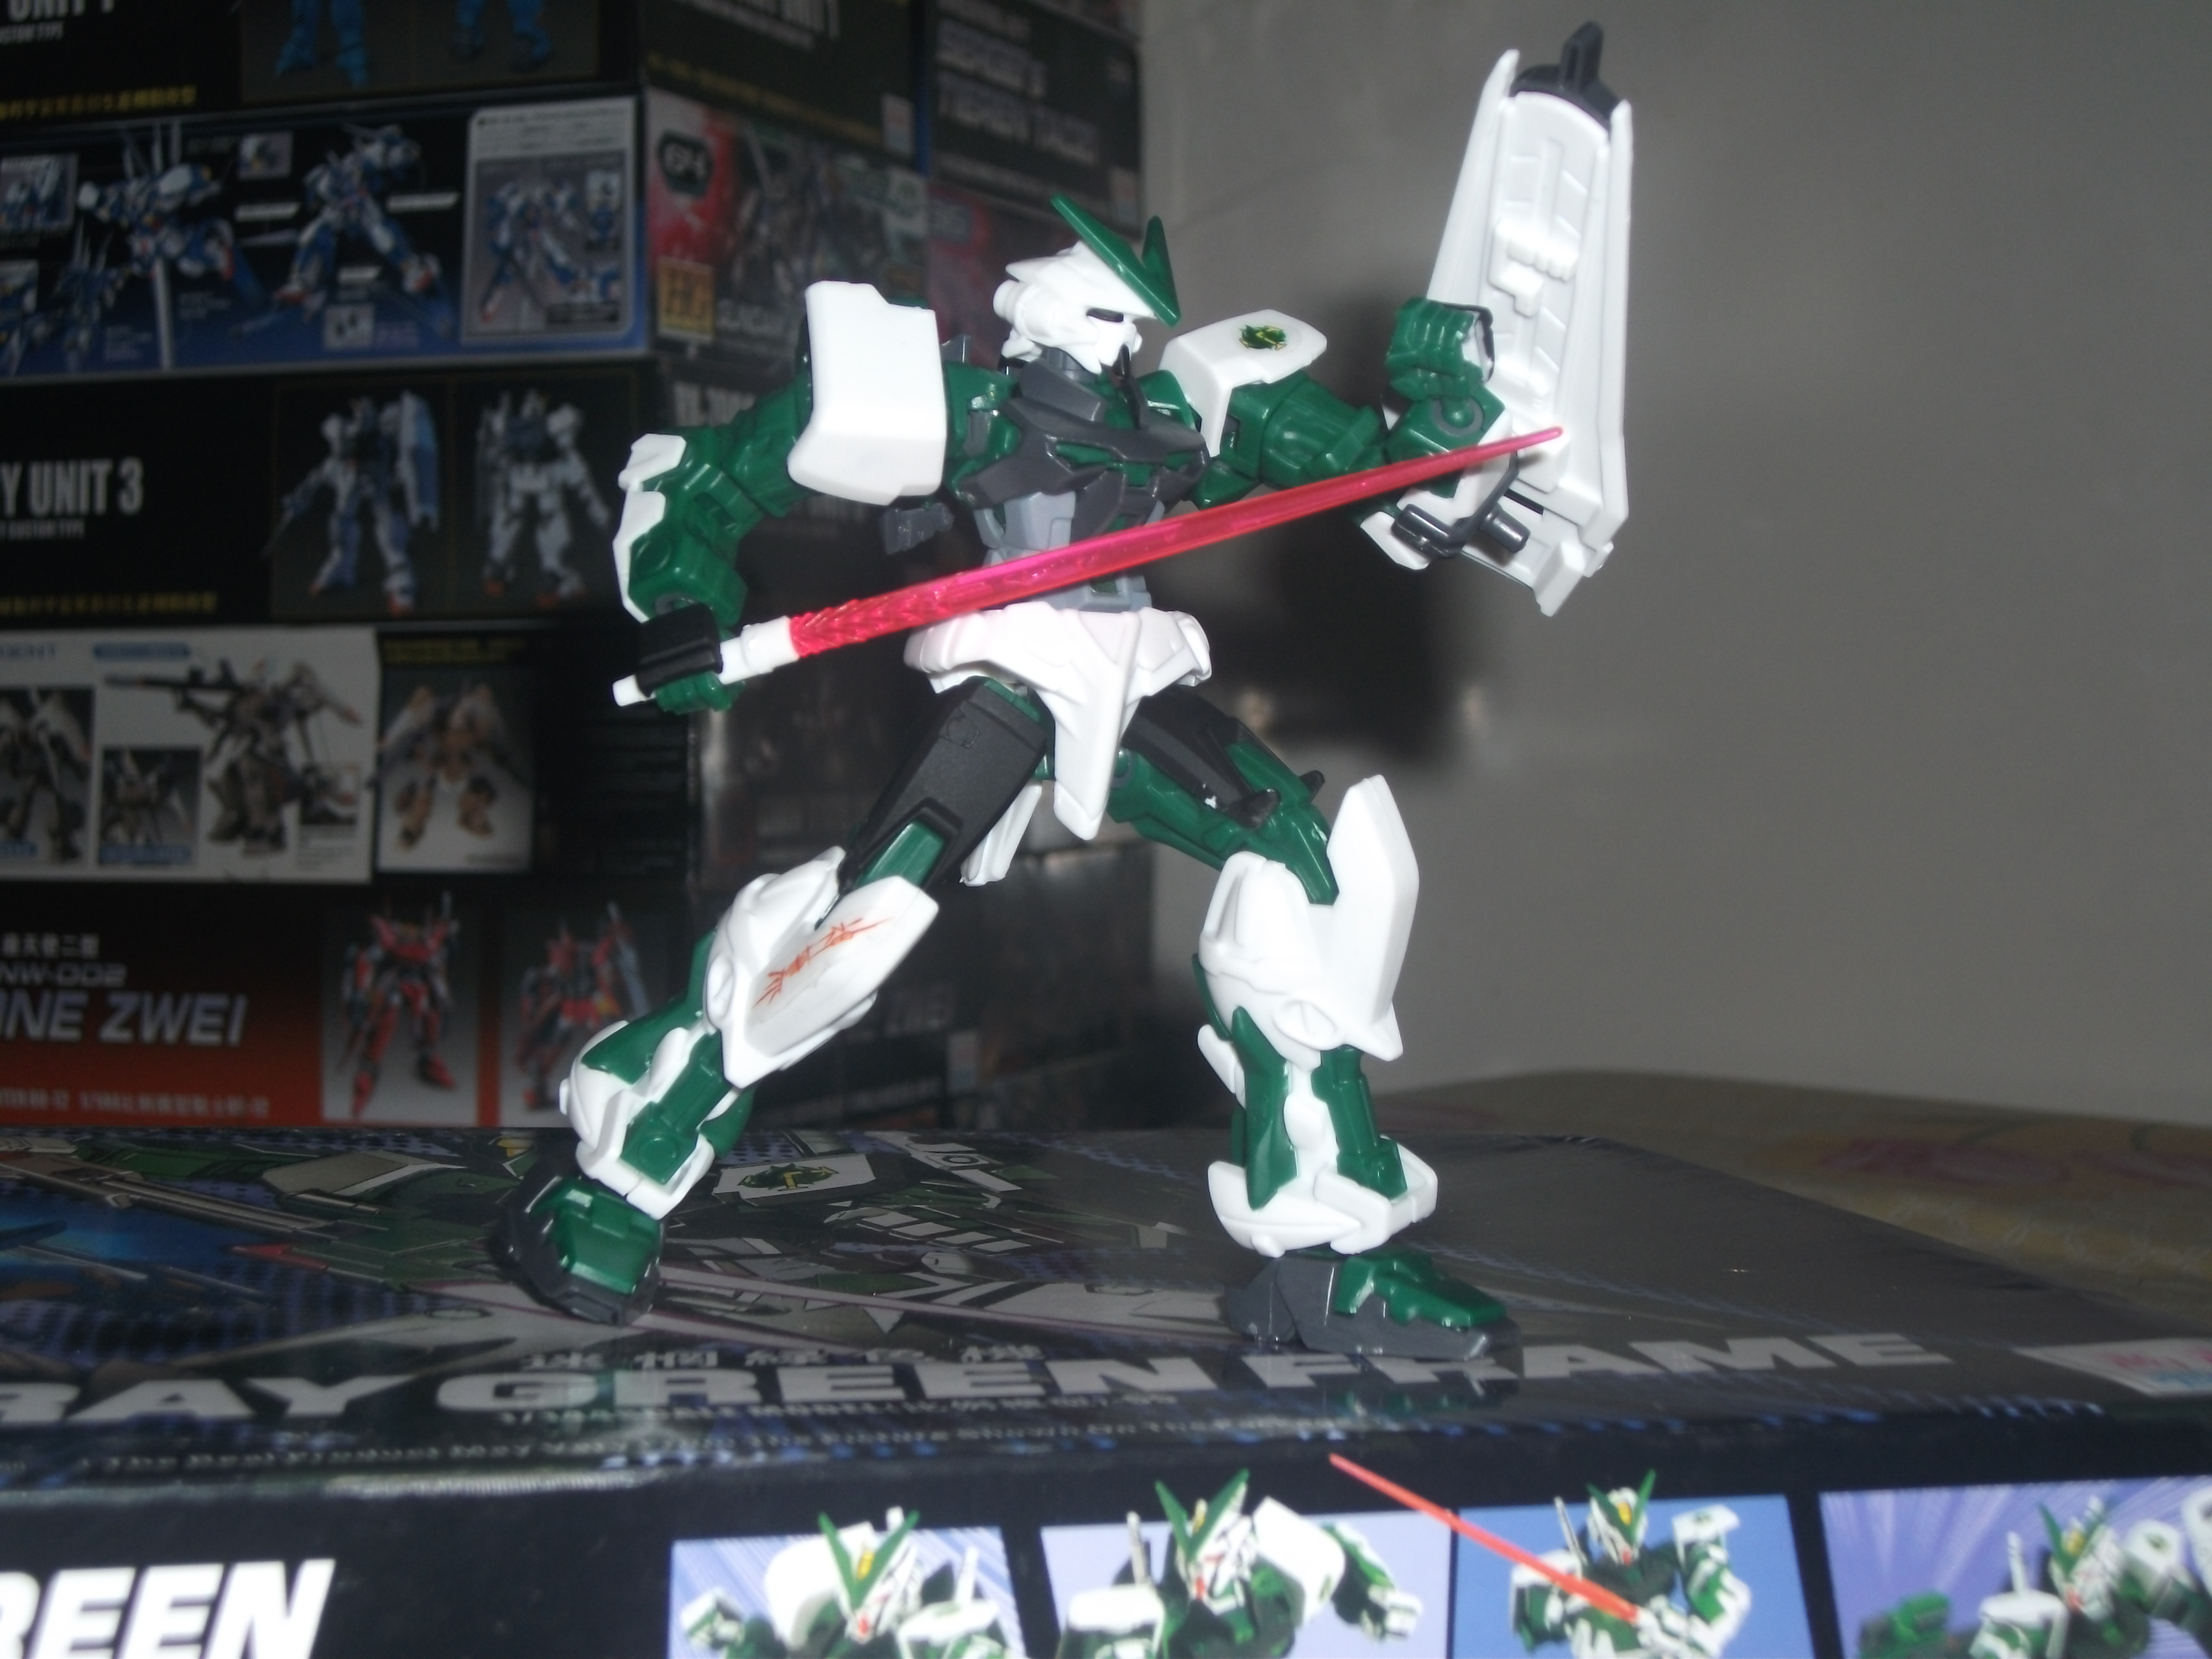 gambar / foto astray green frame koleksi pribadi saya. Gambar diambil